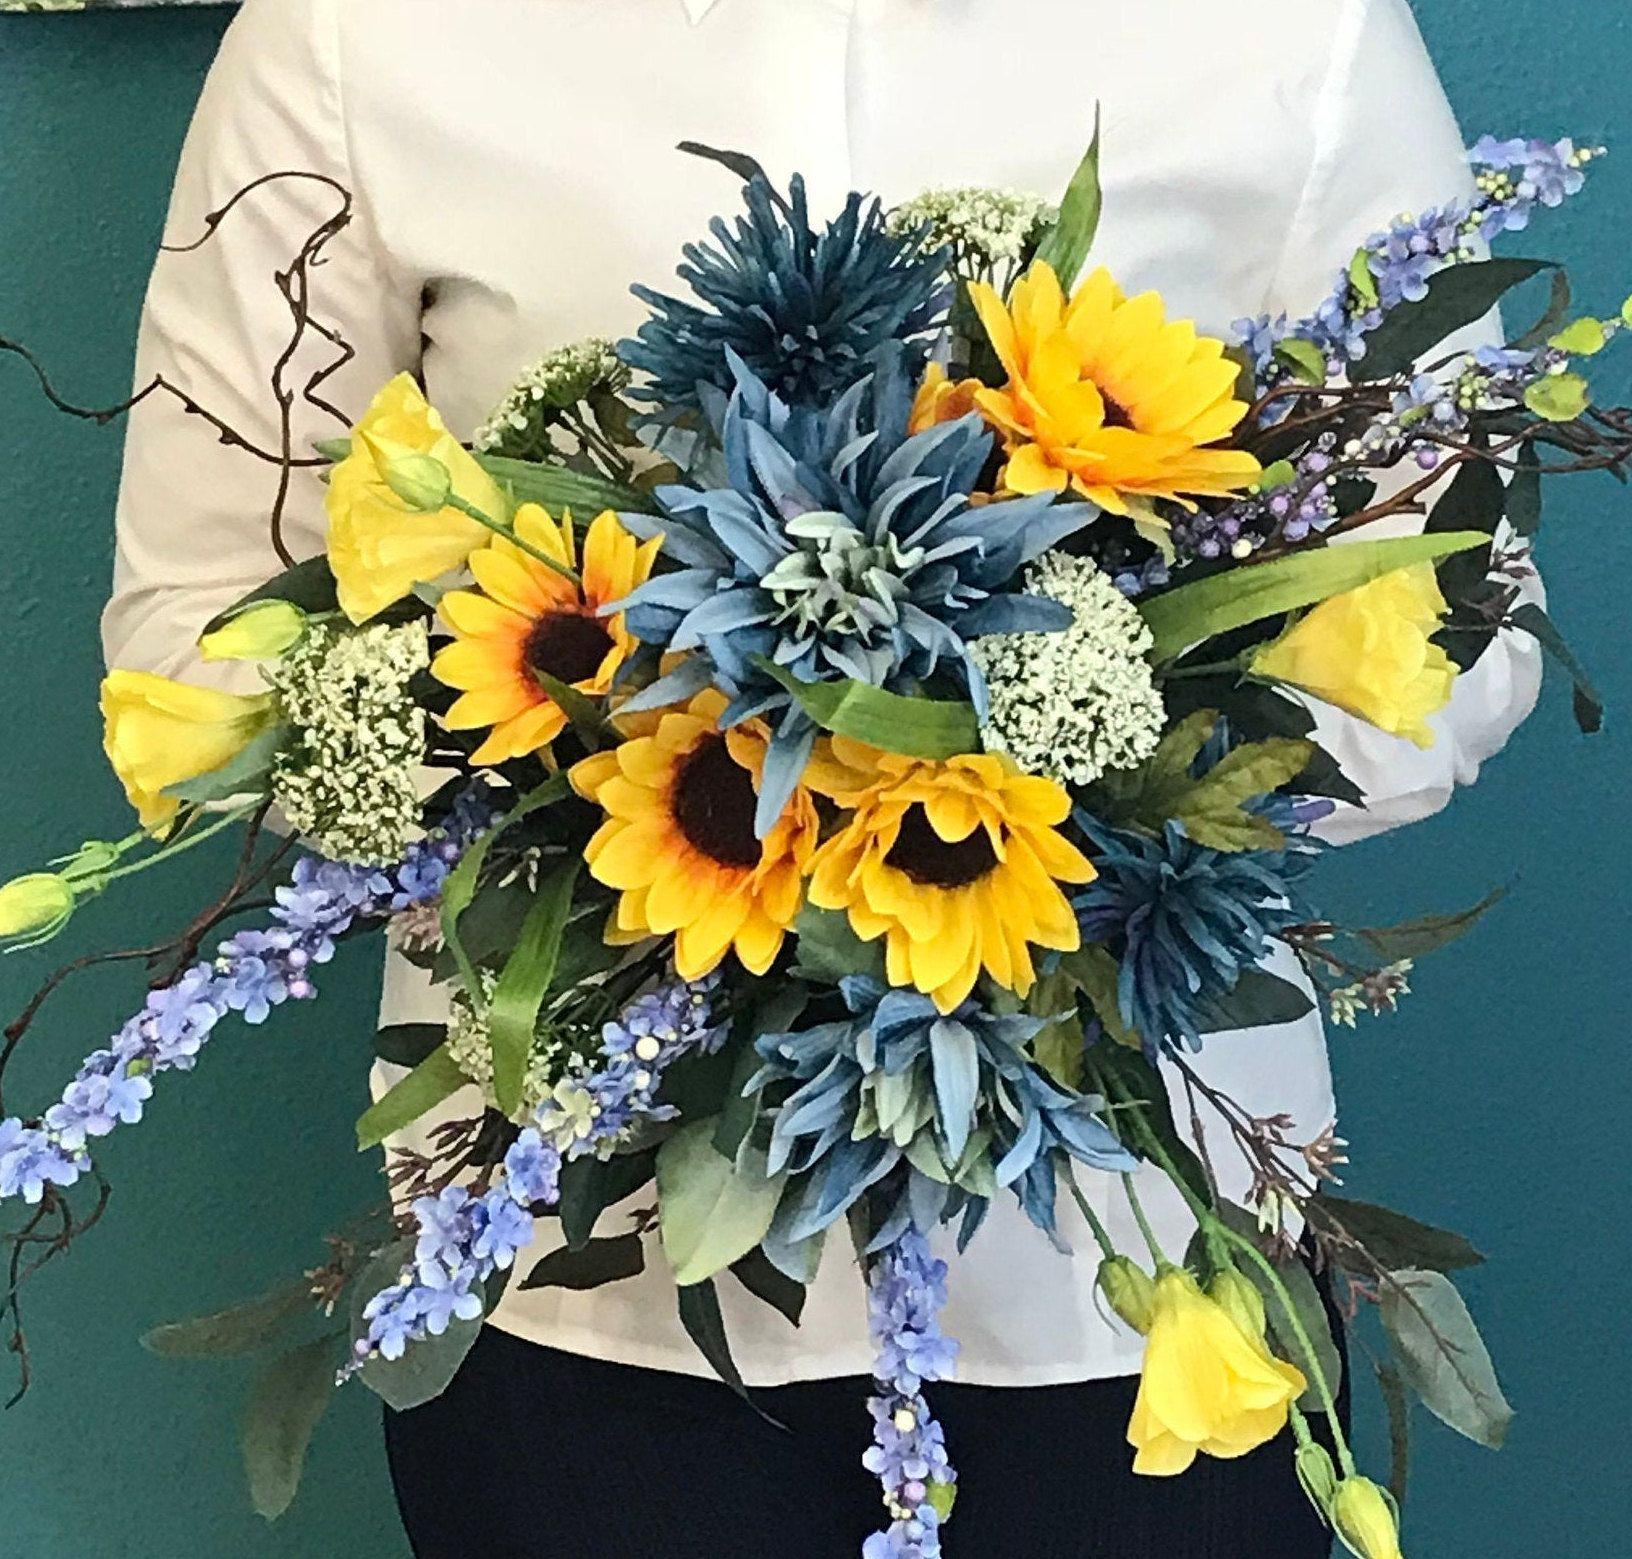 Extra Large Indigo & Sunflower Silk Cascading Bridal Bouquet-Blue Silk Dahlia Bouquet-Sunflower Bridal Bouquet-Unique Blue Sunflower Bouquet #silkbridalbouquet